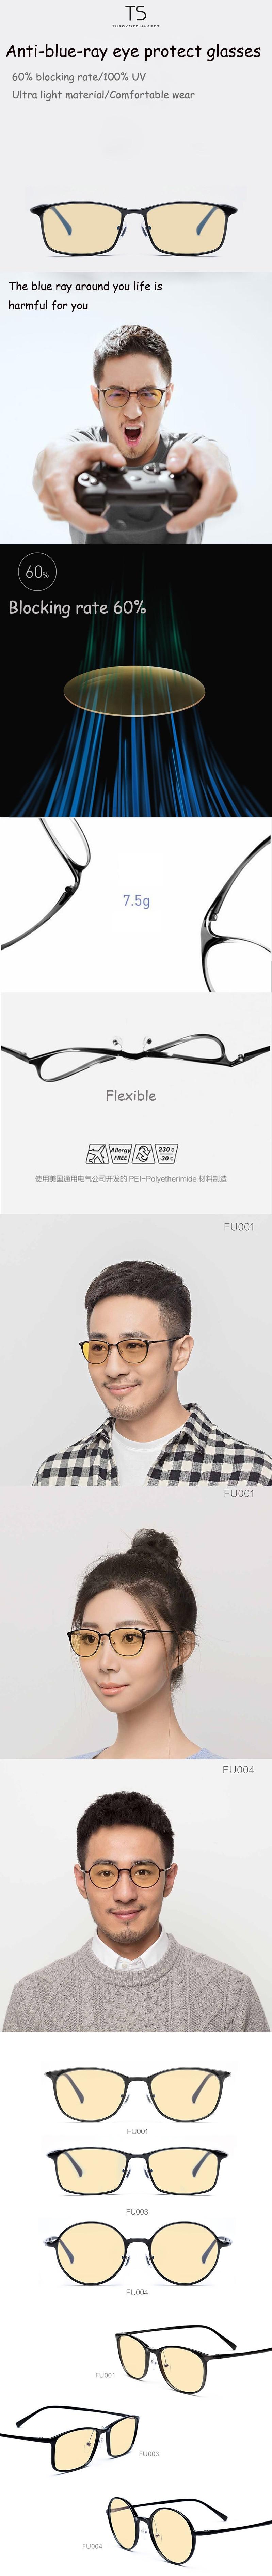 Prezentare-Xiaomi-TS-FU001880cc549d5afd58e.jpg